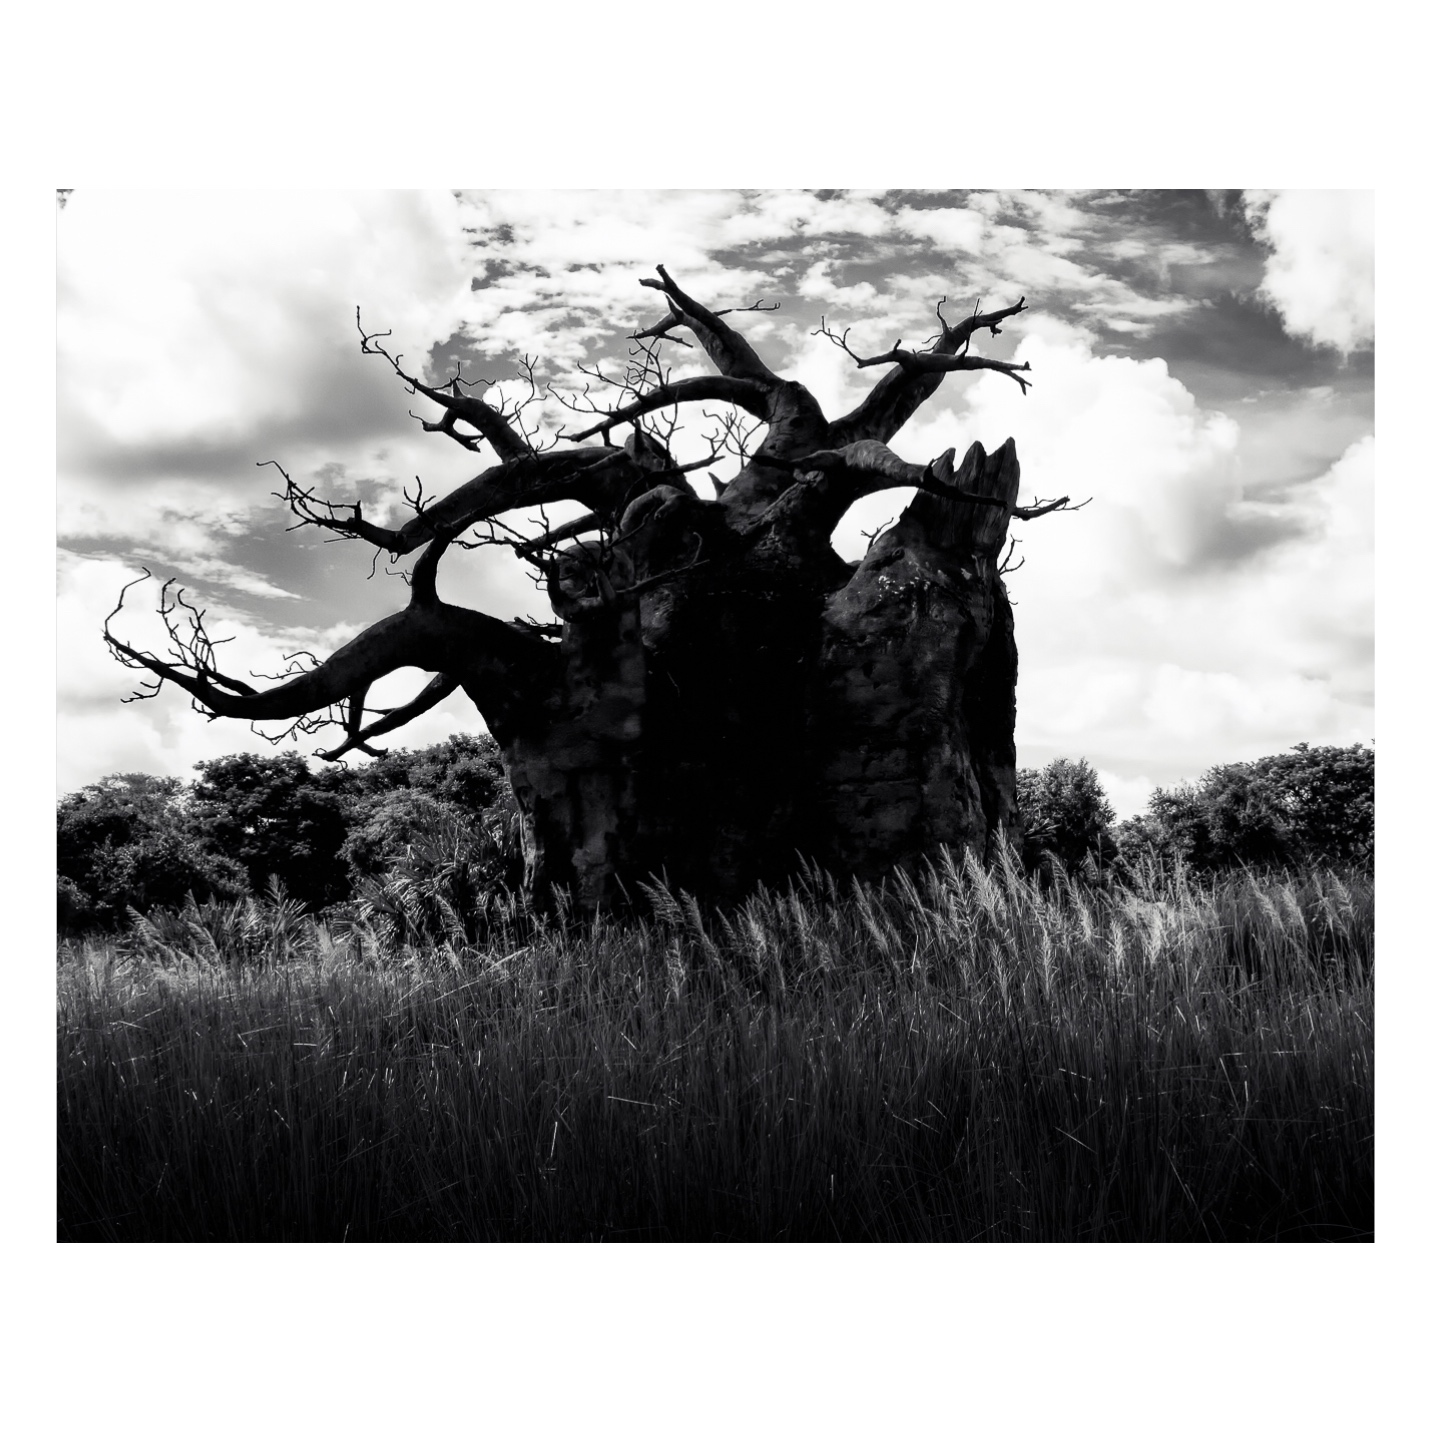 Safari Tree-0001-Brian Suman Photography.jpg